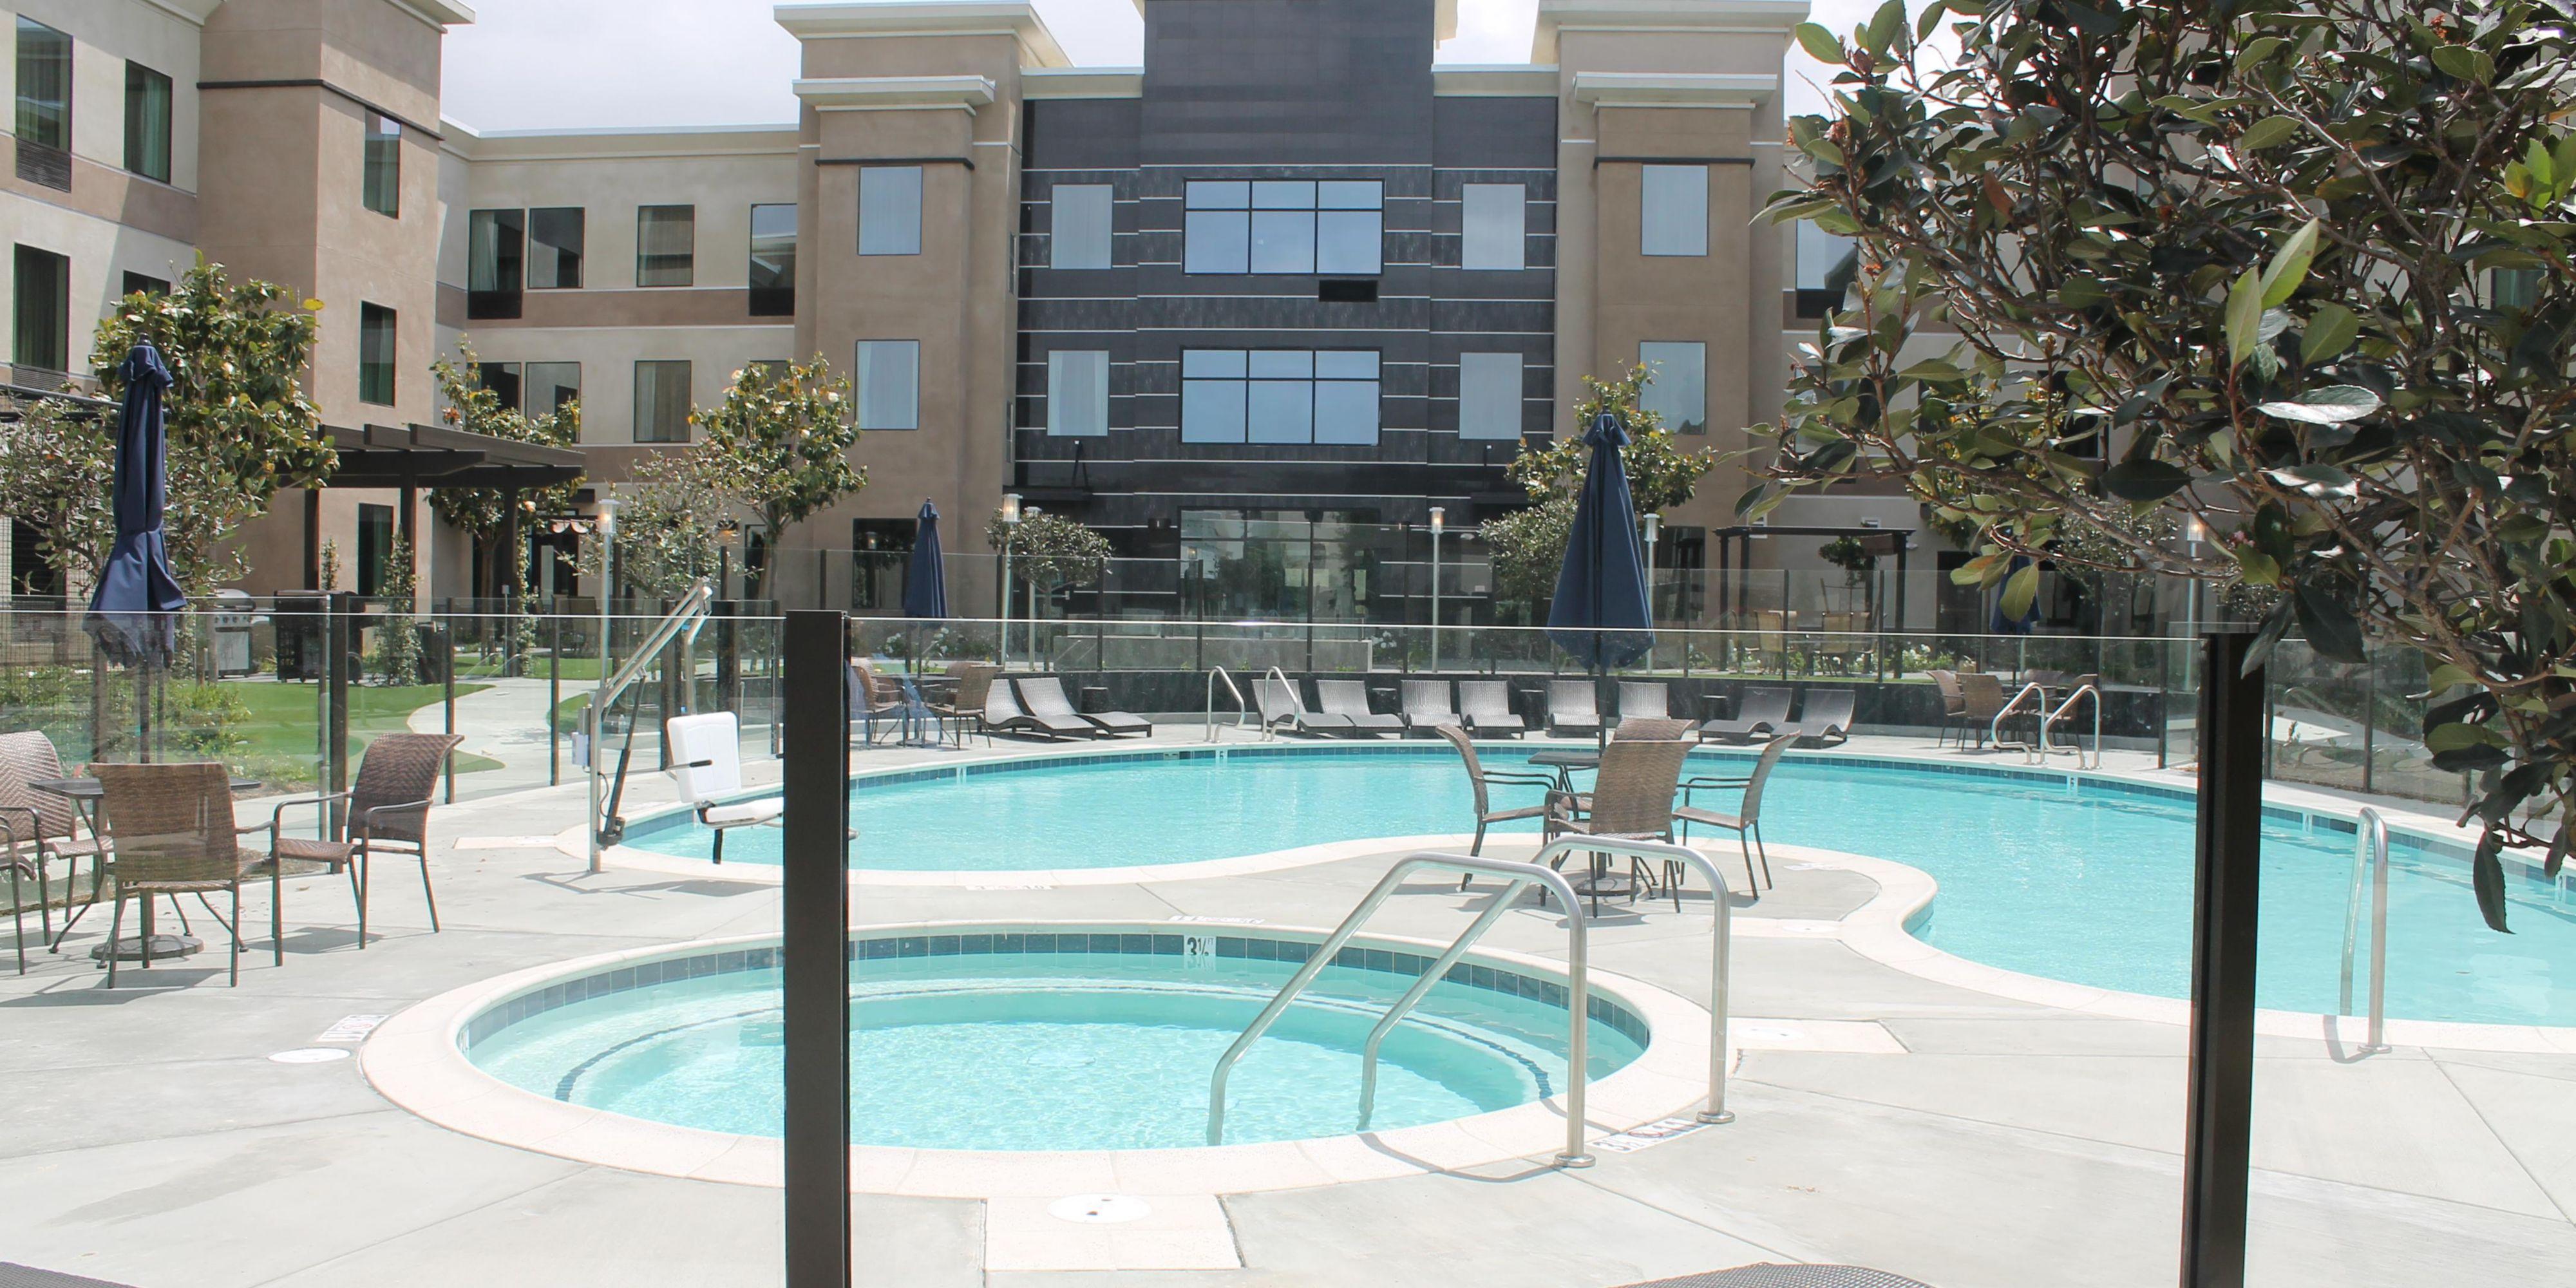 Staybridge Suites Carlsbad - San Diego image 2